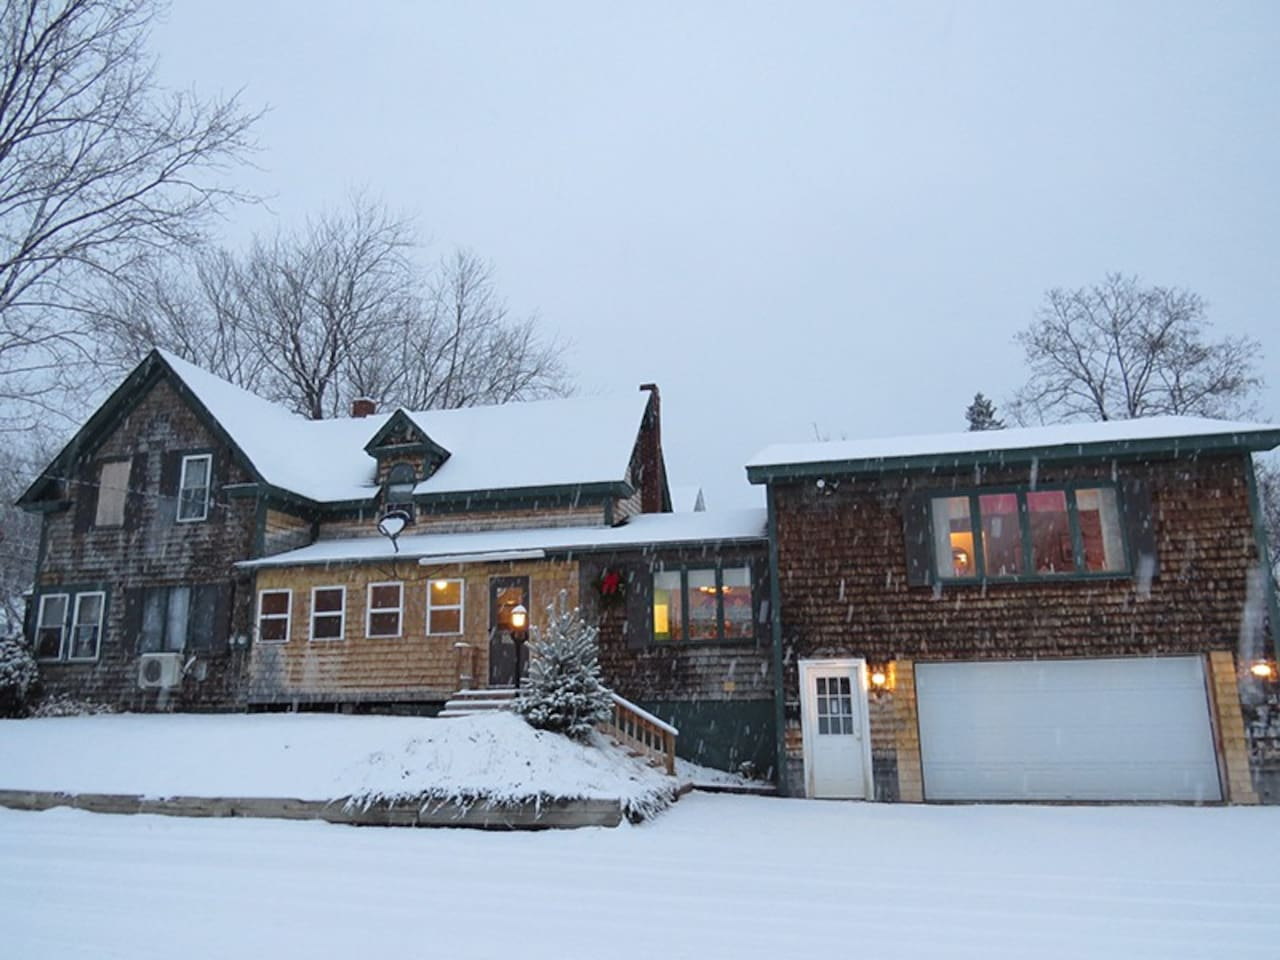 Your cozy winter sledding home base!